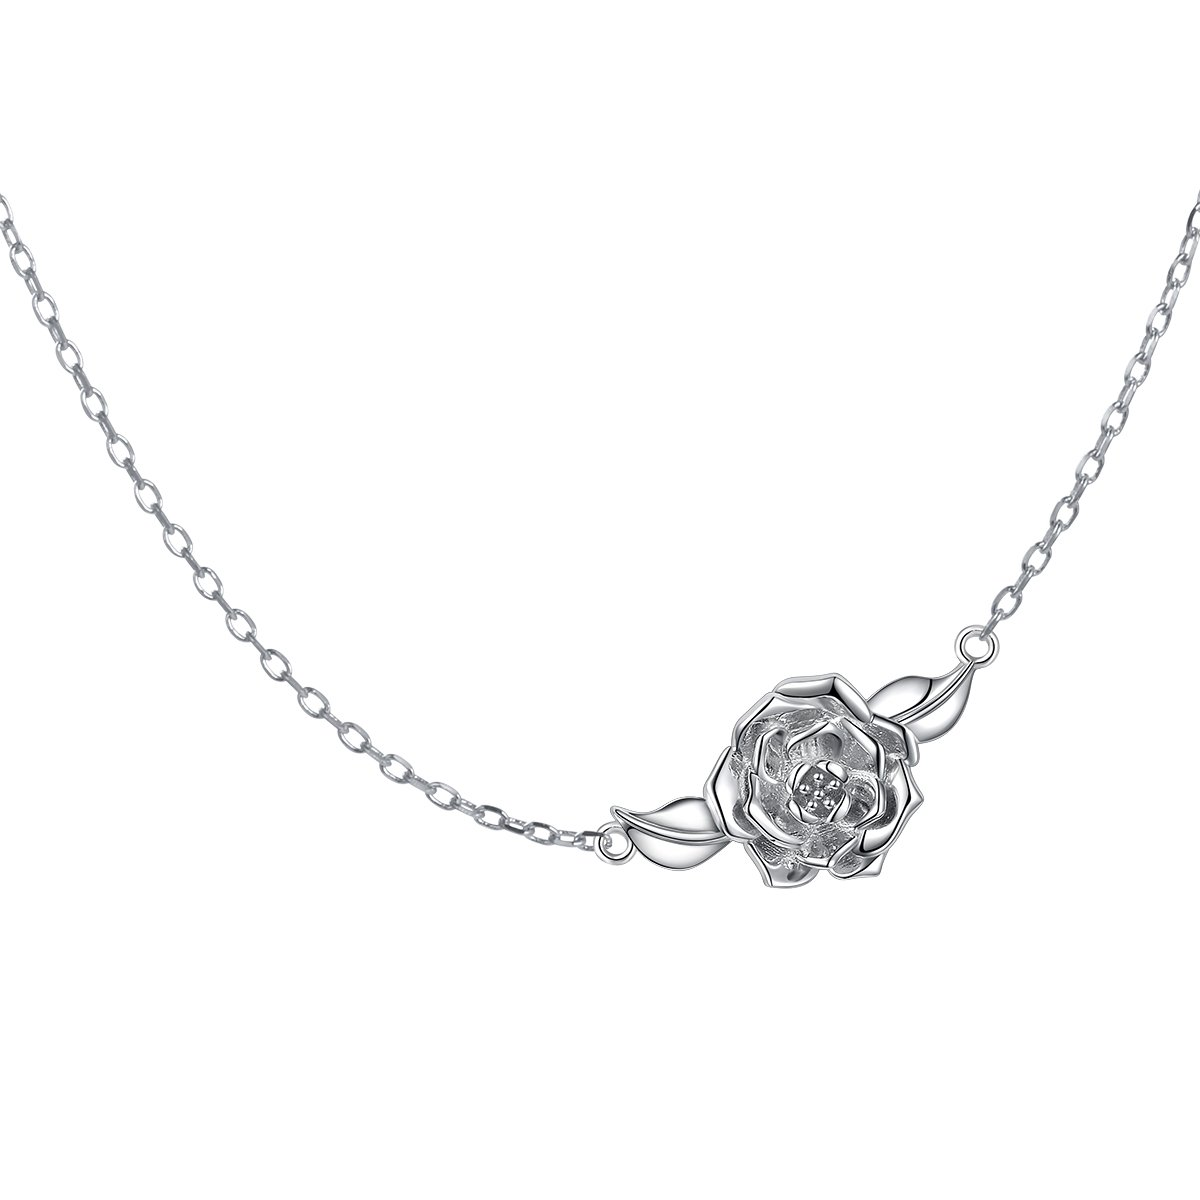 S925 Sterling Silver Jewelry Sideways Camellia Flower Choker Necklace 15+3''